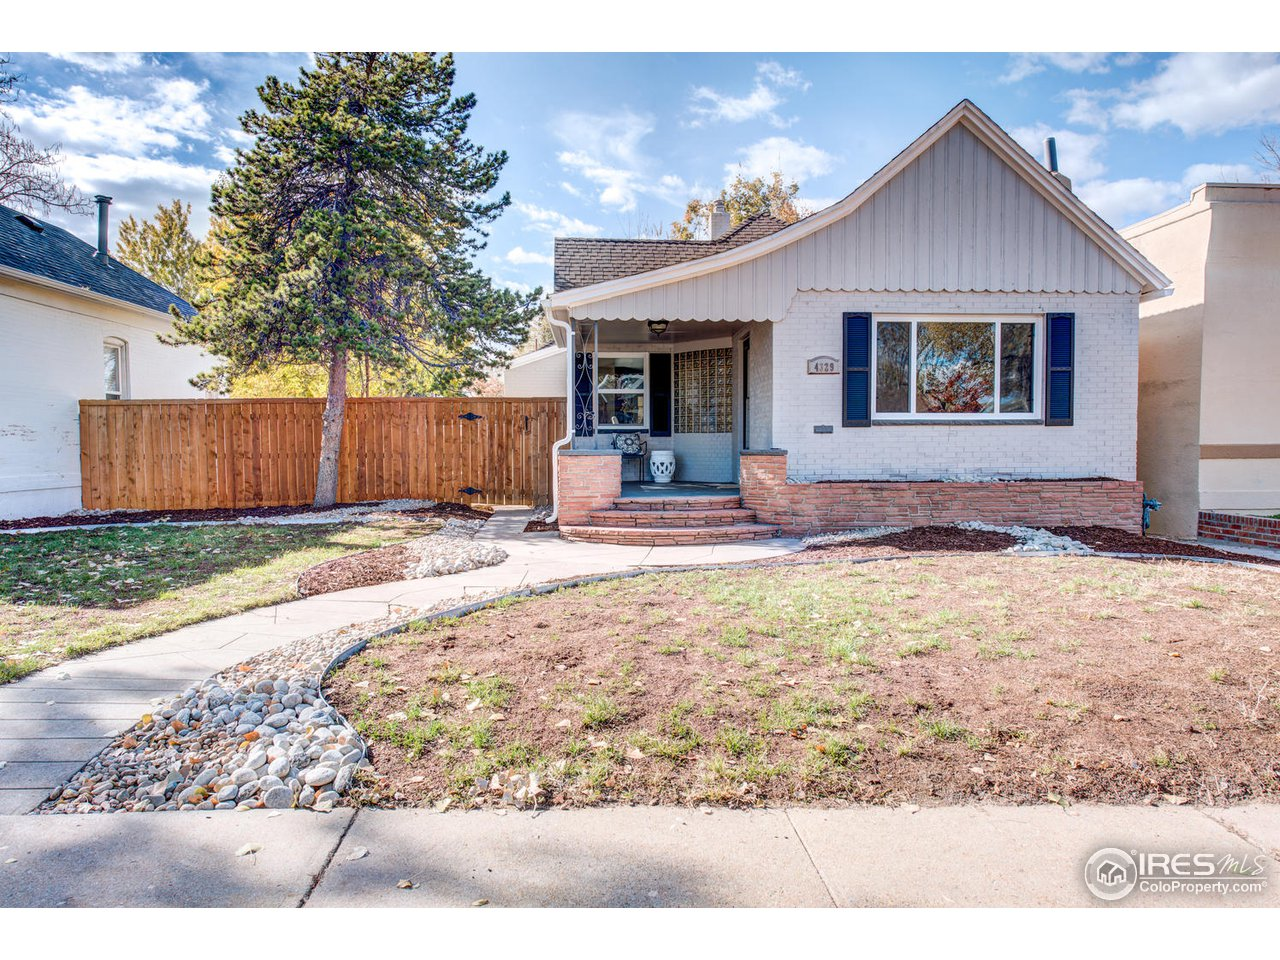 4329 Ames St, Denver CO 80212